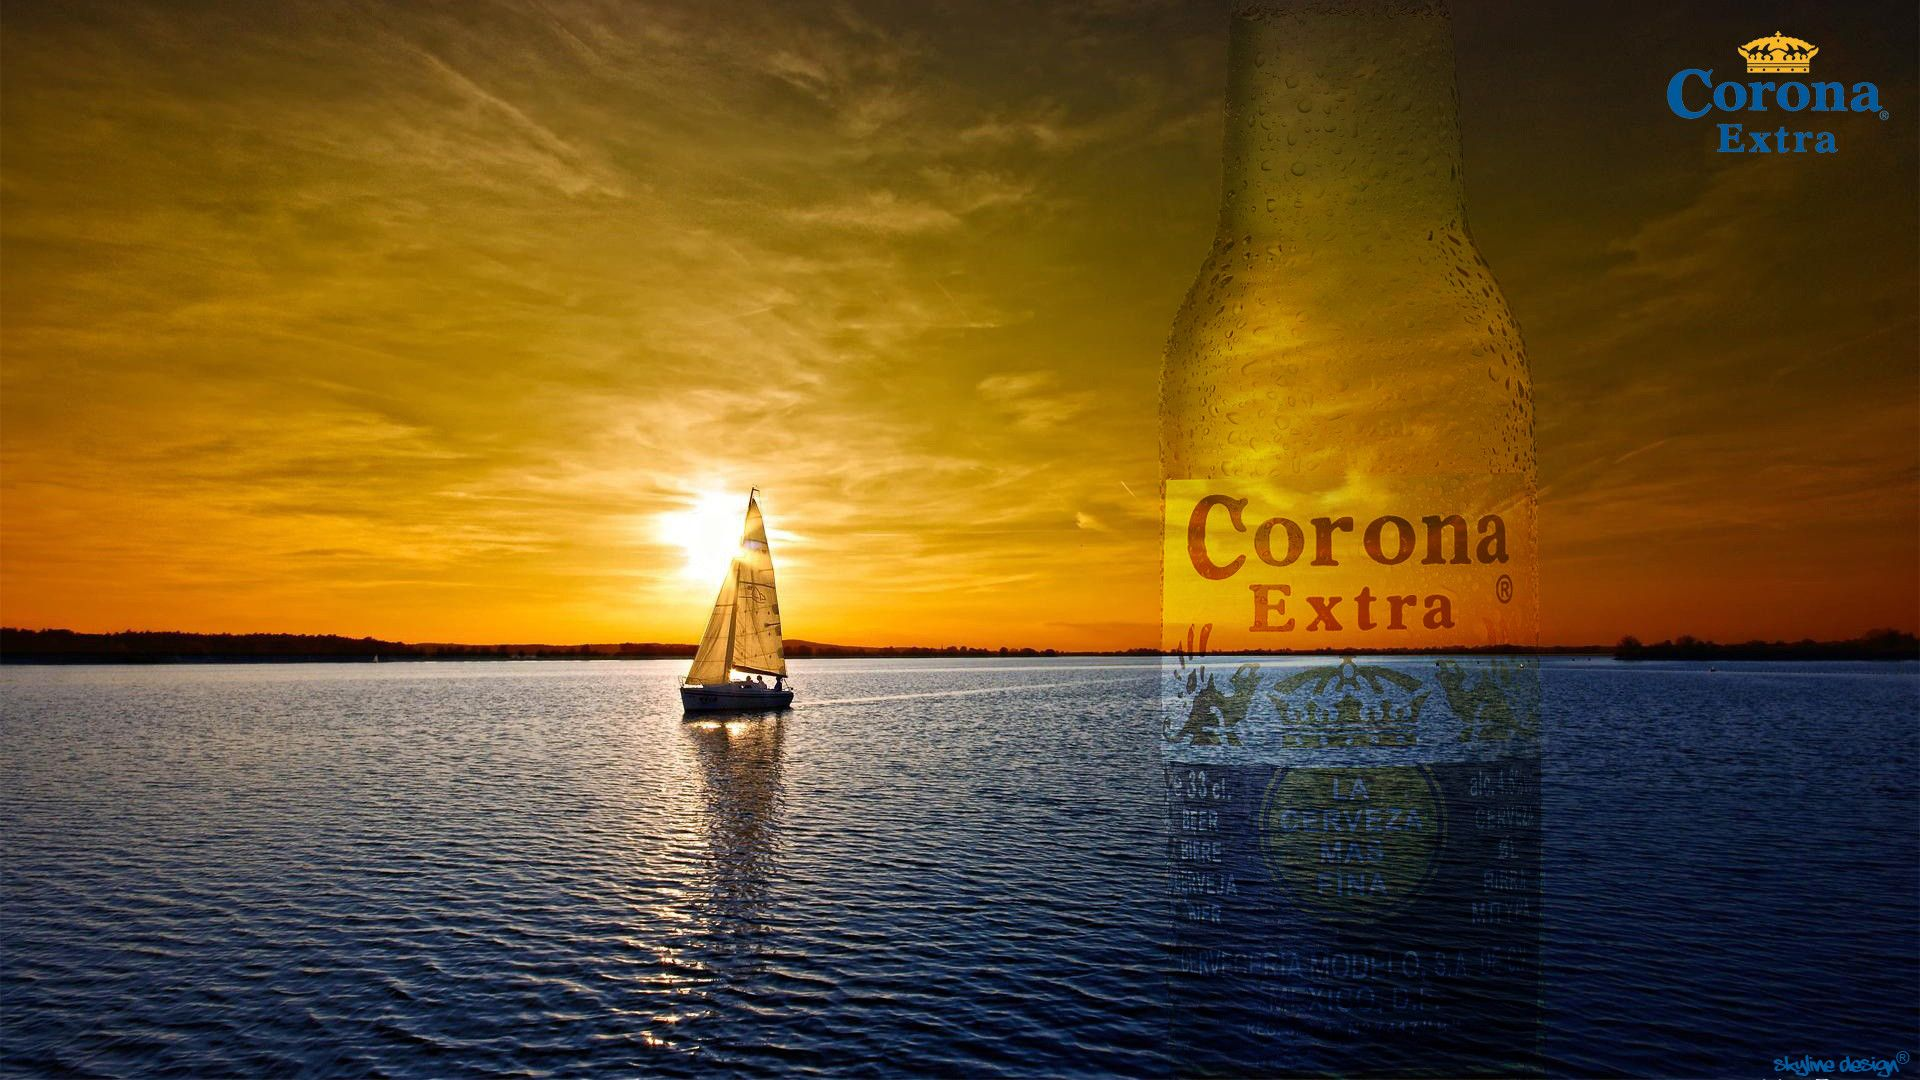 Corona Beach Wallpaper: Corona Extra Wallpaper